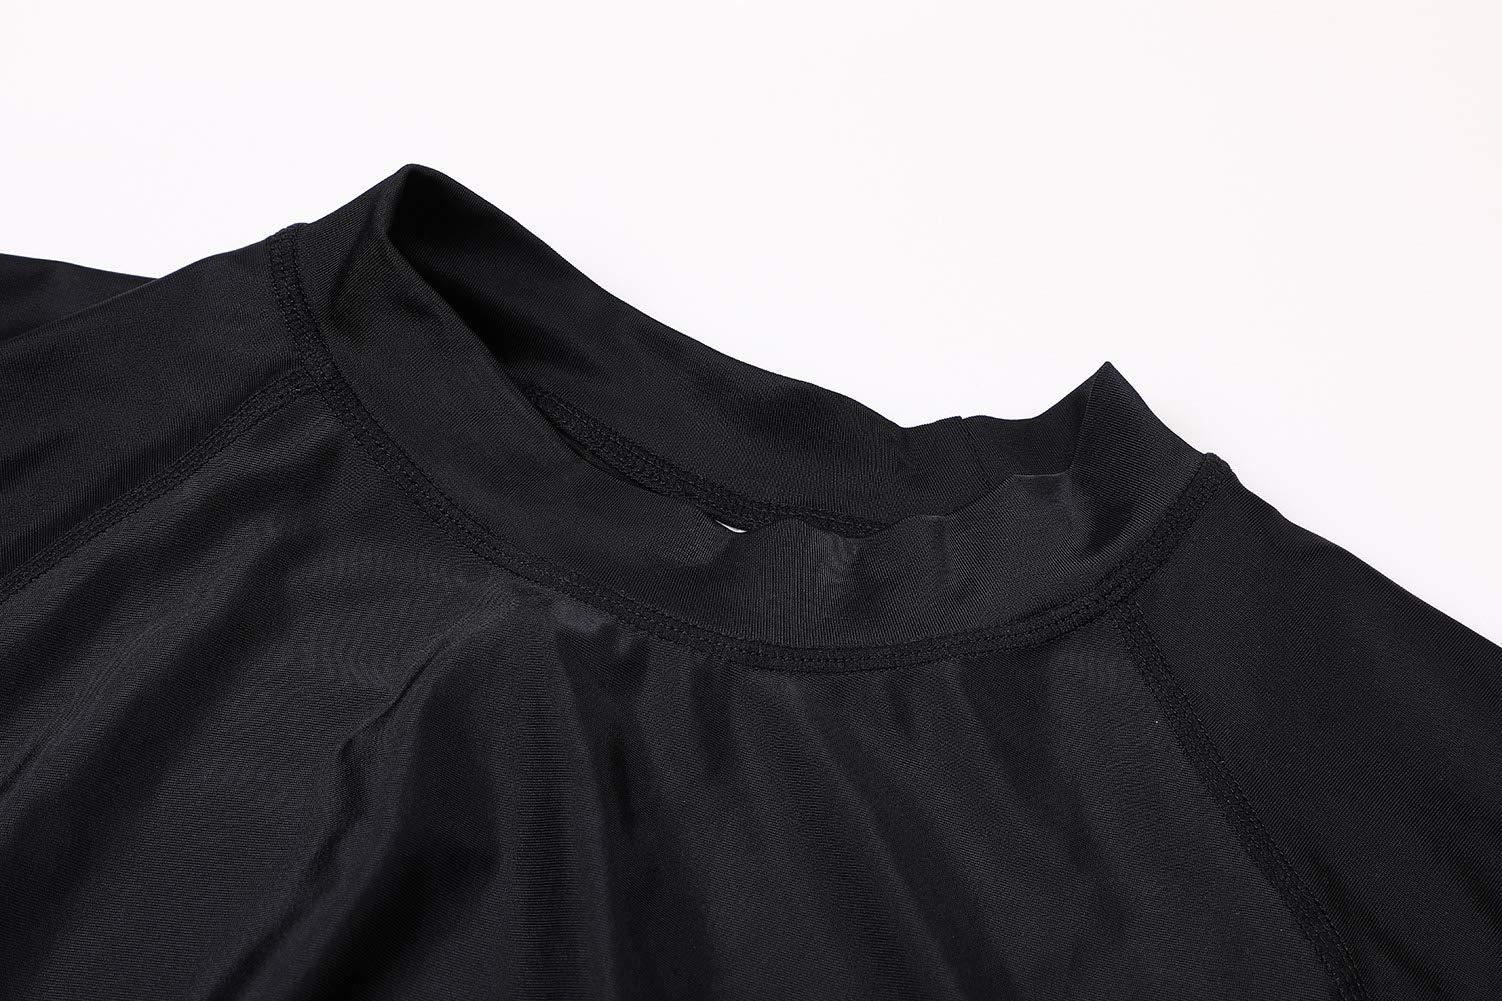 ALove Woman Long Sleeve Swim Shirt Quick Dry Rashguard Swim Top Black M by ALove (Image #6)